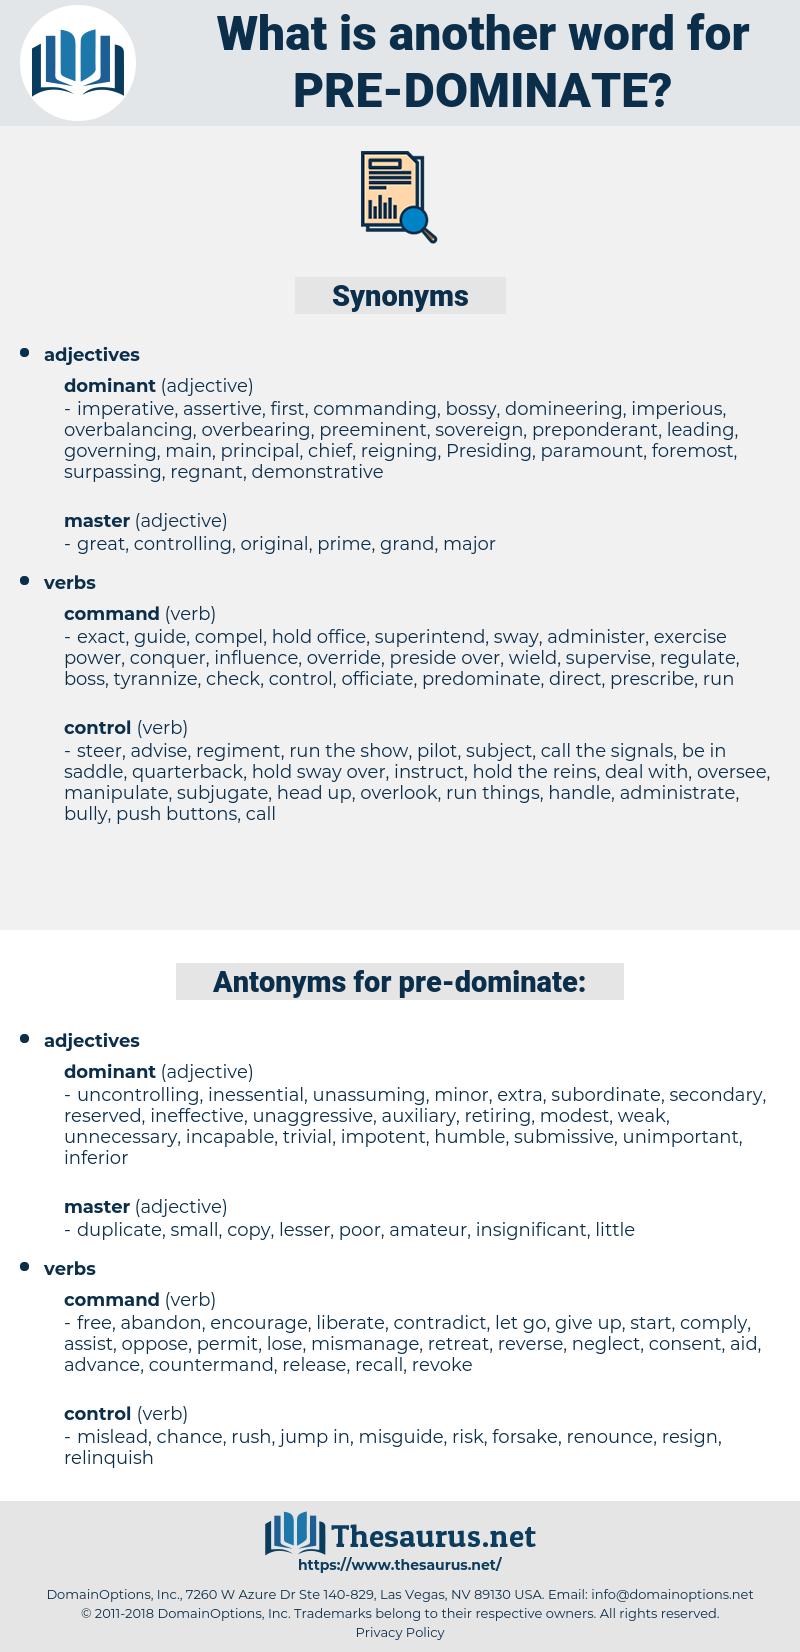 pre-dominate, synonym pre-dominate, another word for pre-dominate, words like pre-dominate, thesaurus pre-dominate